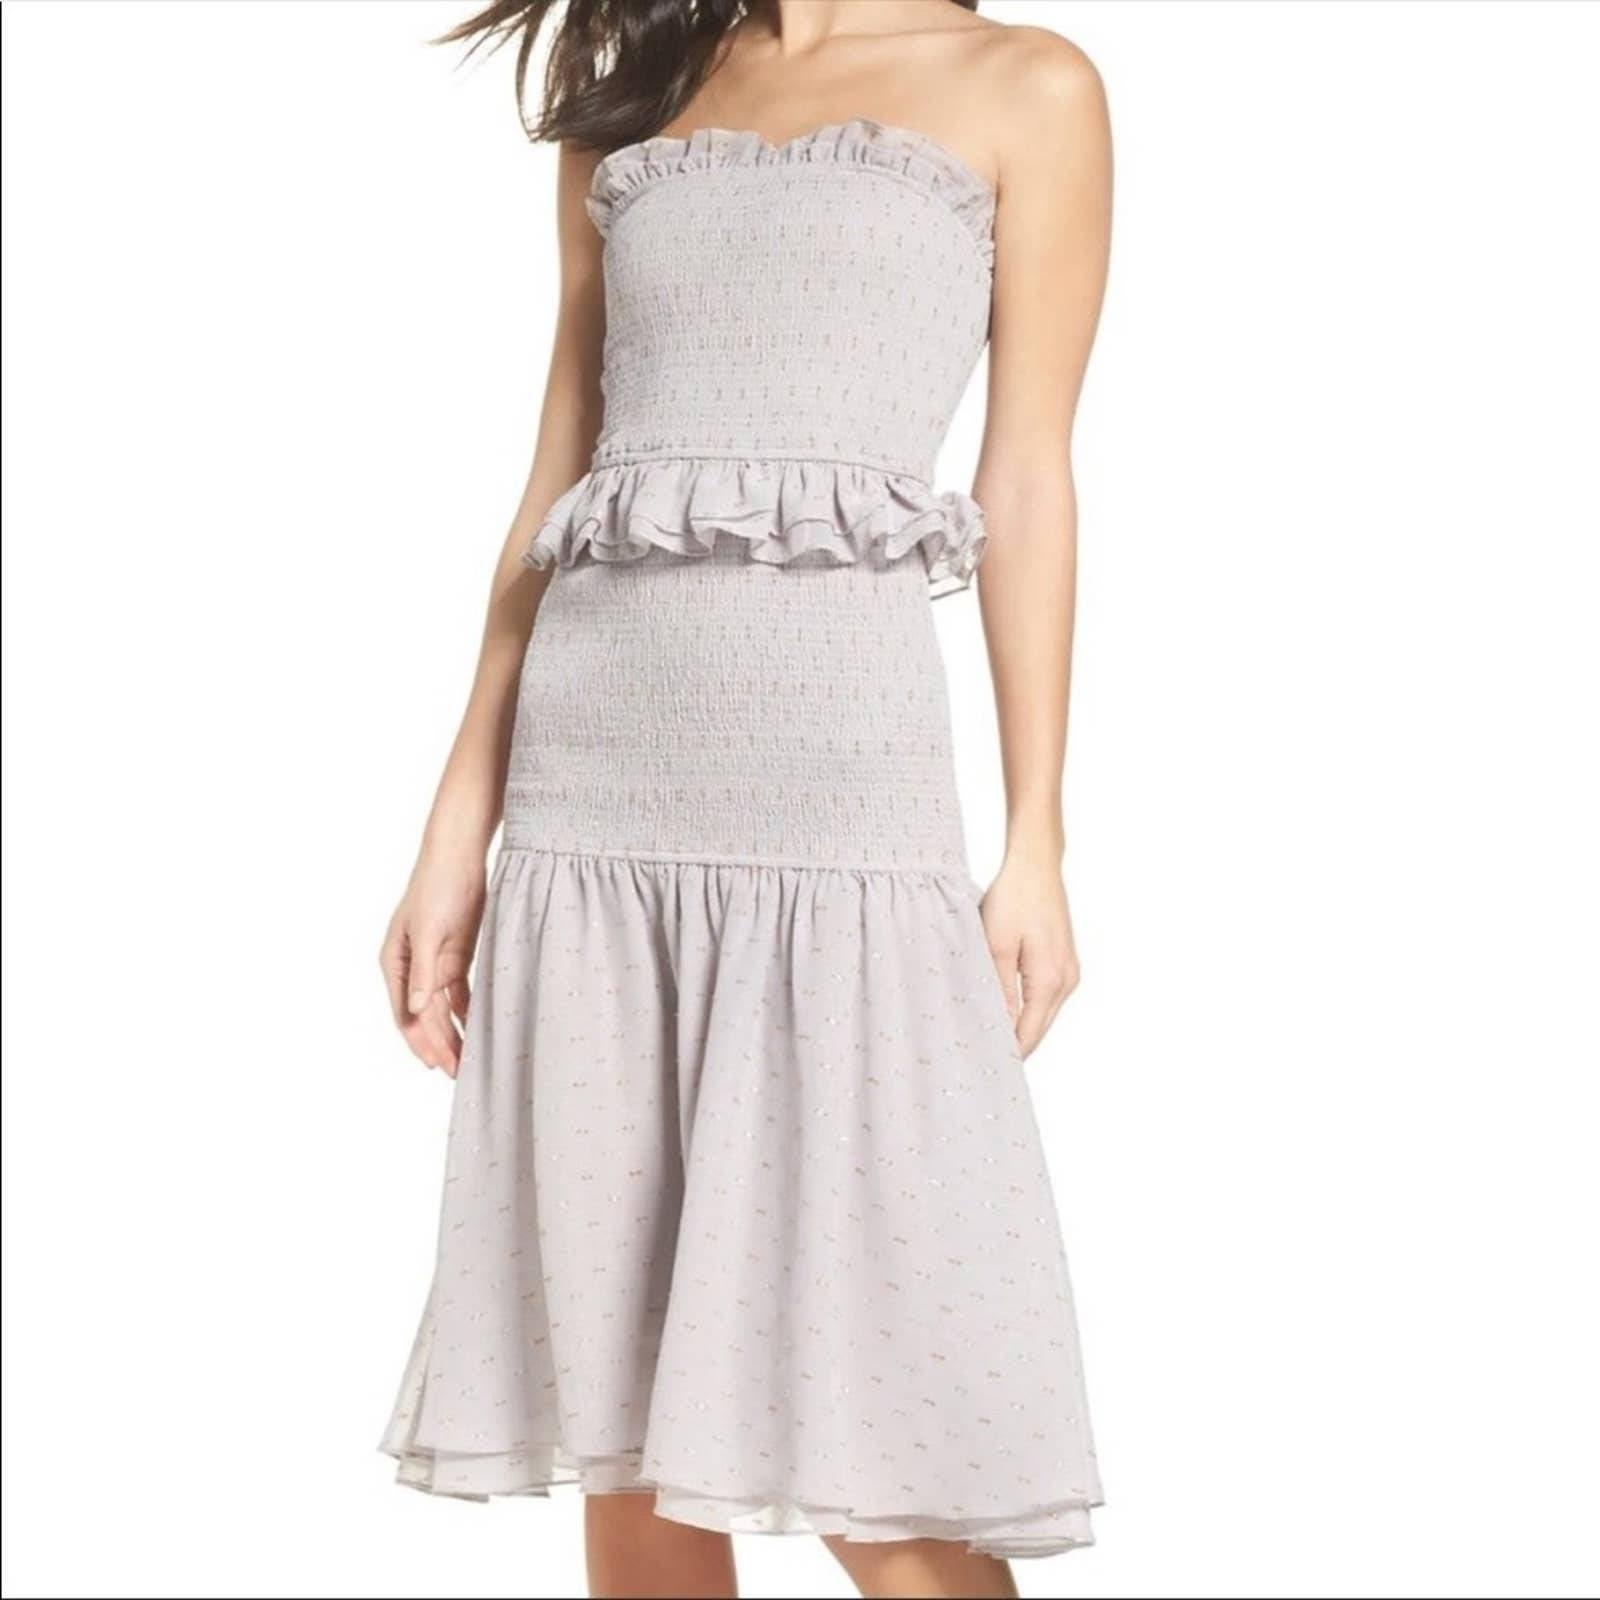 Cooper St Grey Smocked Midi Dress